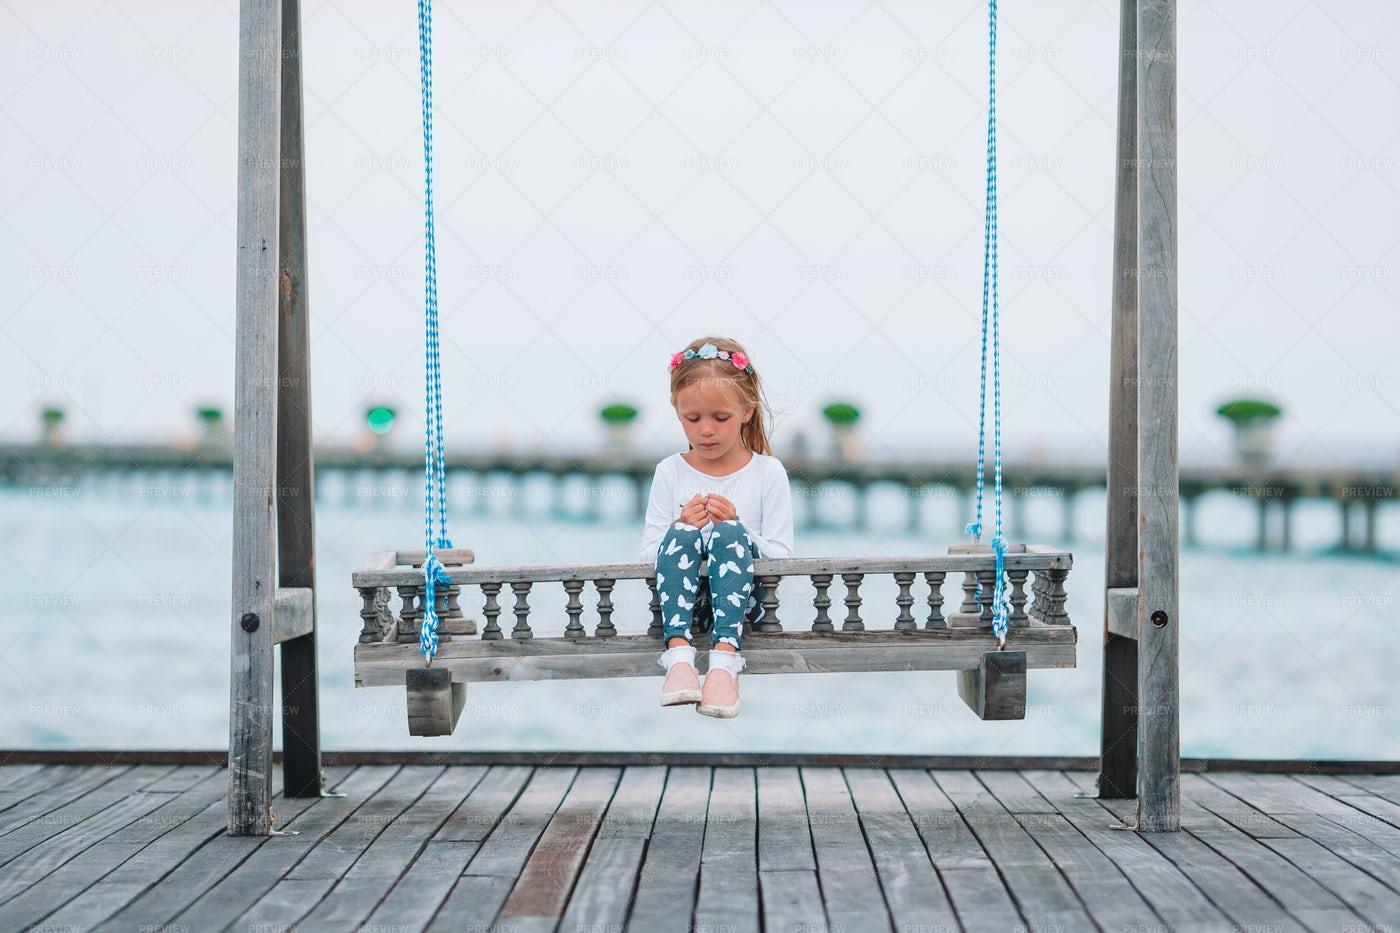 Girl On Wooden Swing: Stock Photos